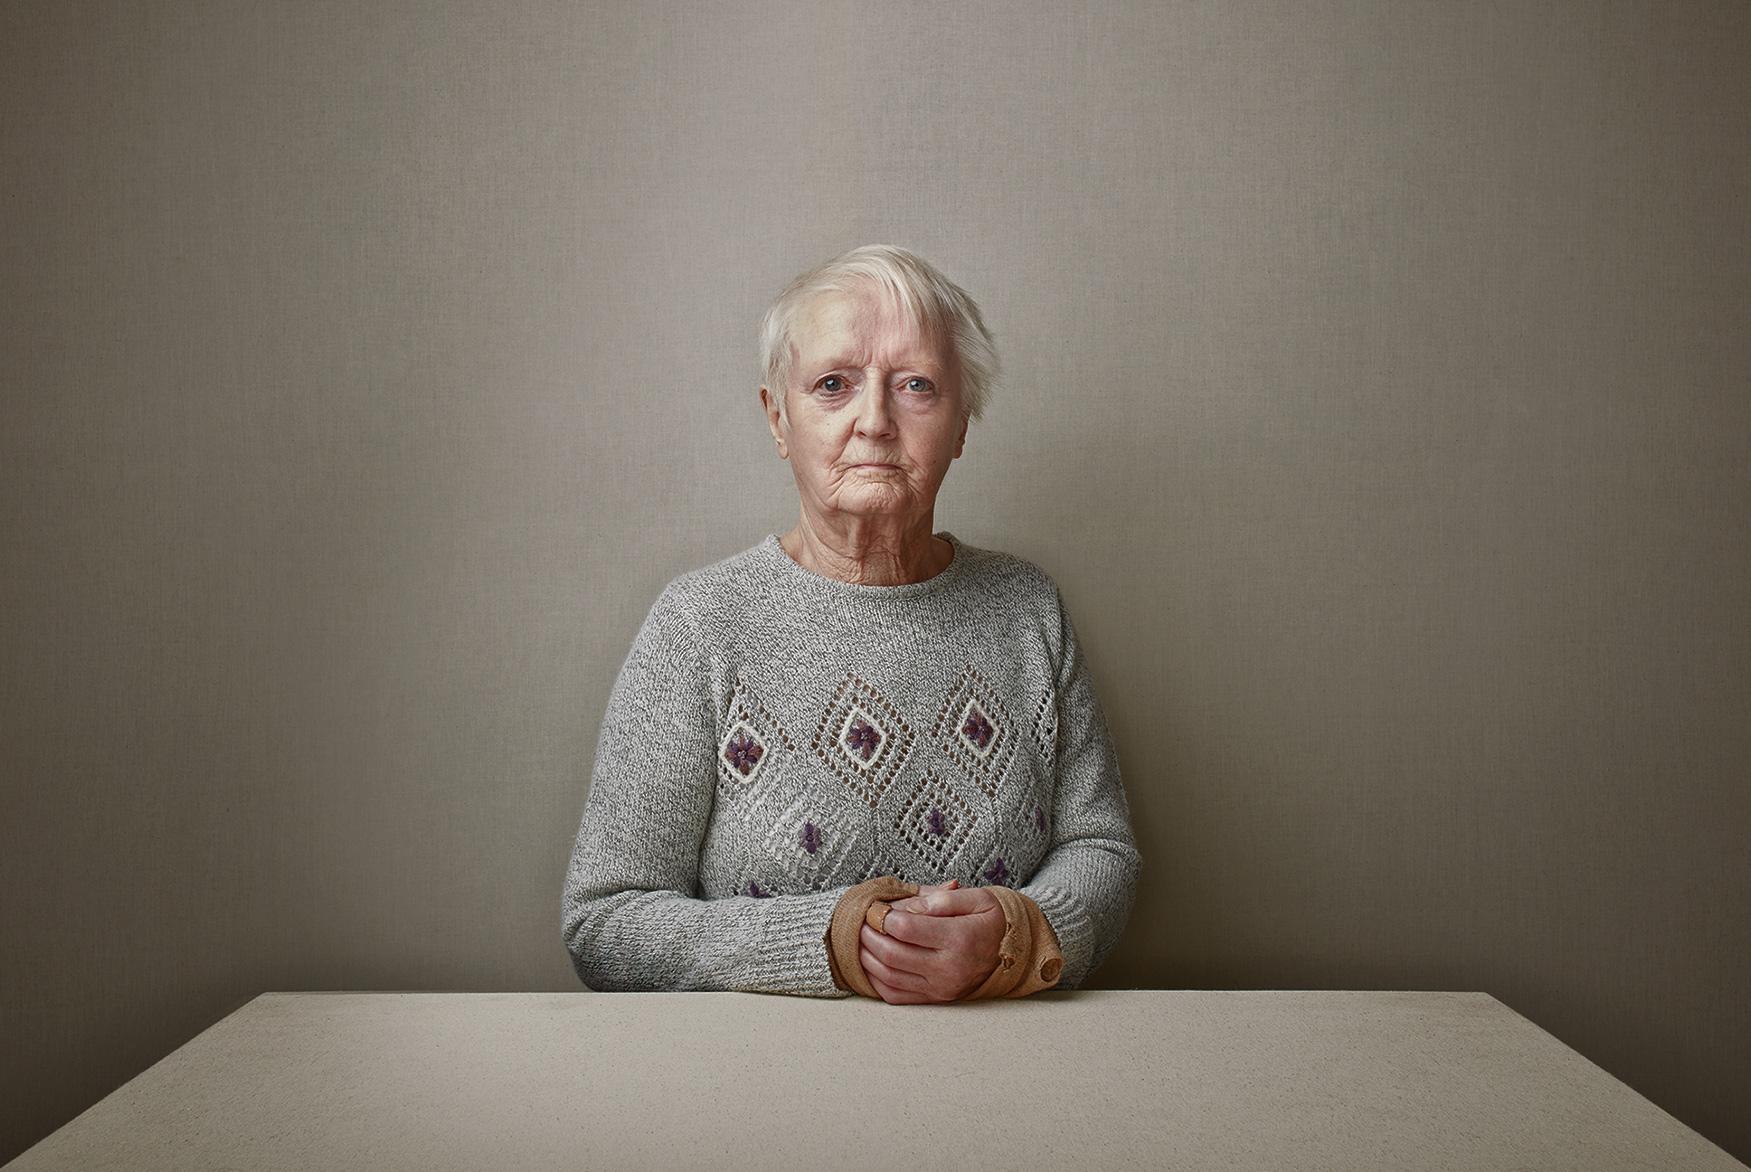 Mum-Portrait-UnFlat-MASTER_-FINAL.jpg